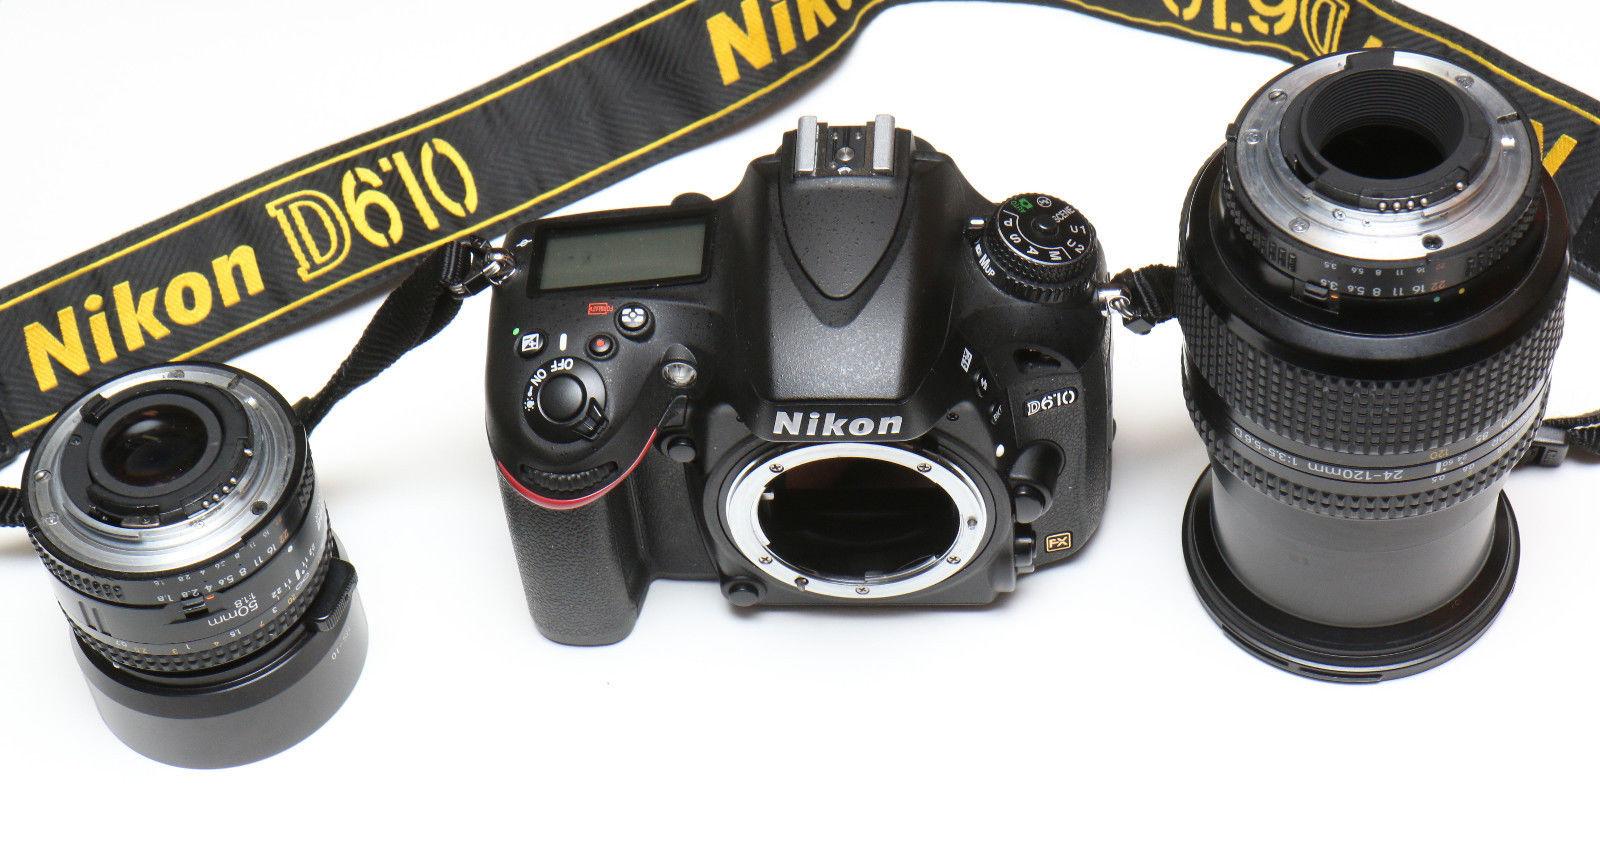 Nikon  D610 24.3 MP SLR-Digitalkamera Schwarz  Kit mit 24-120 3,5/5,6 + 50/1:1,8